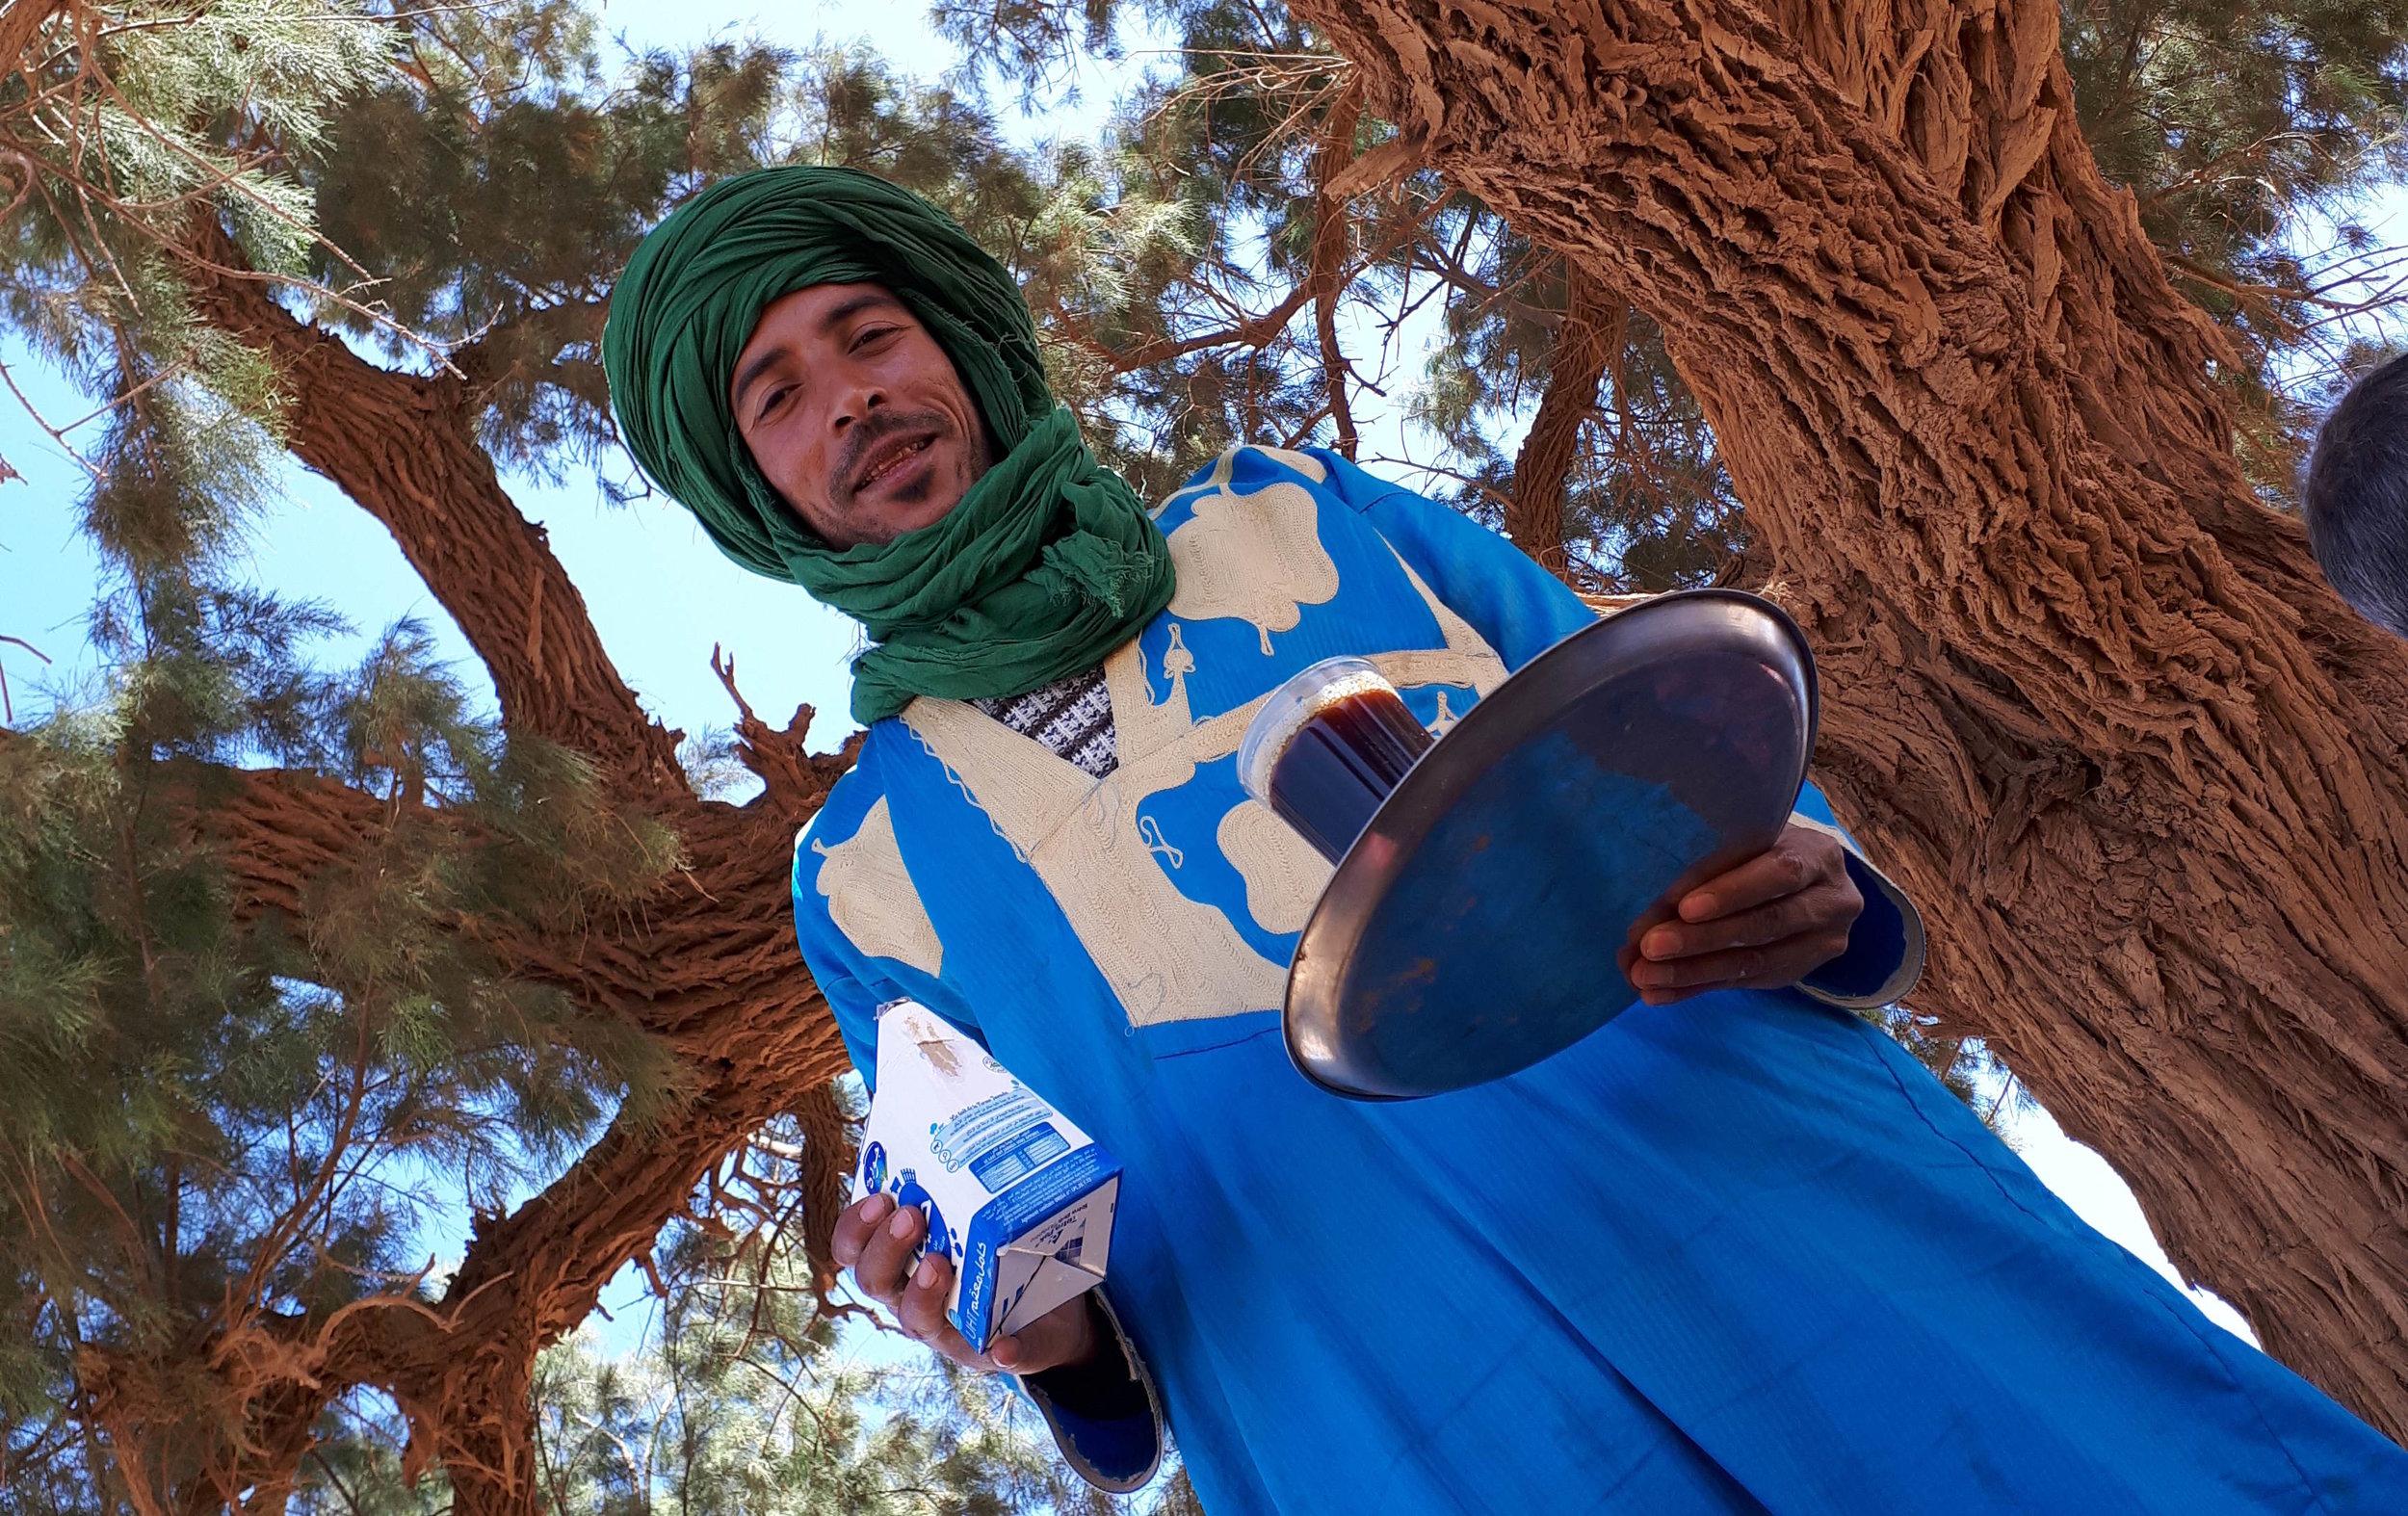 7-14th Moroccan Adventure - Moroccan adventure into silence into the Sahara desert (more information).